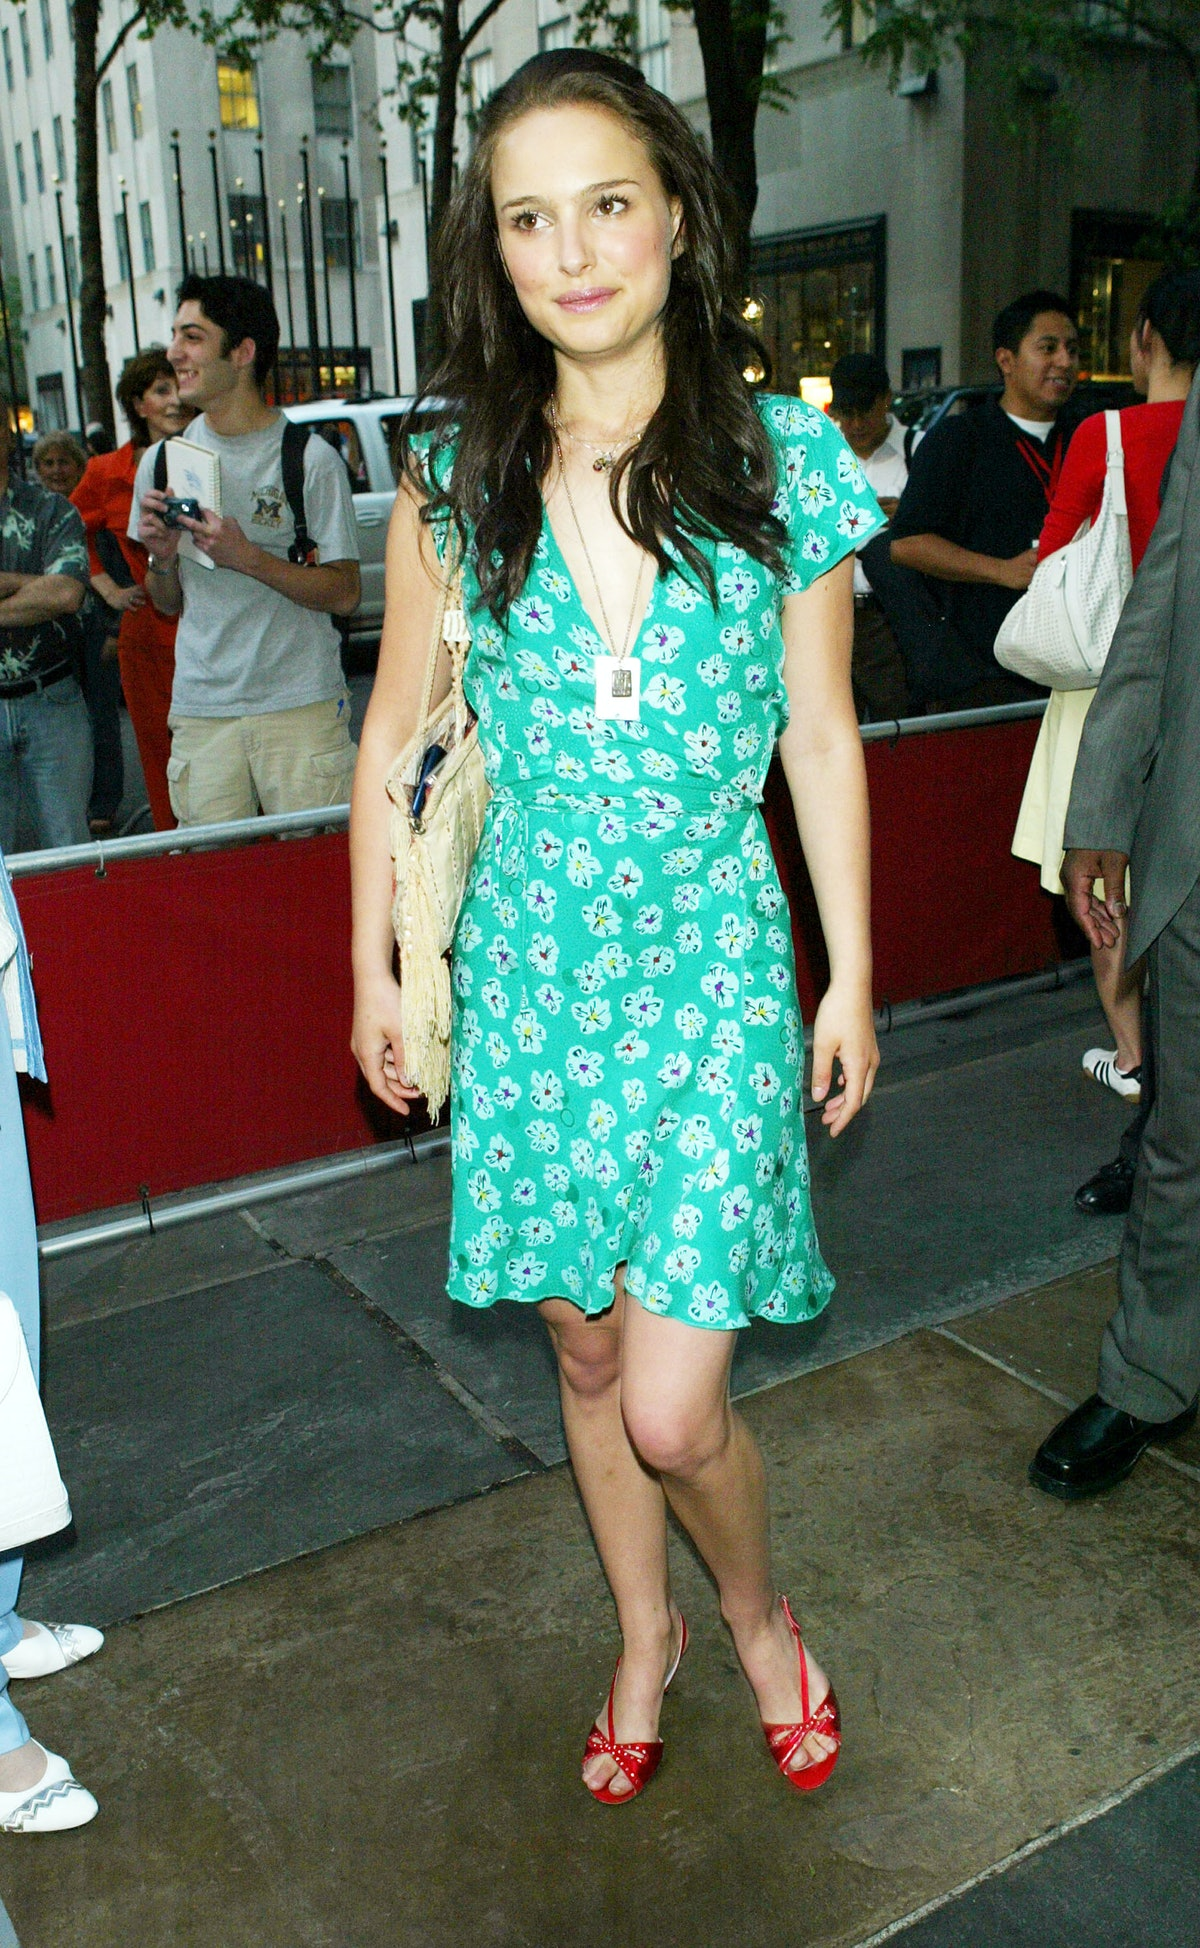 Young Natalie Portman in green dress.